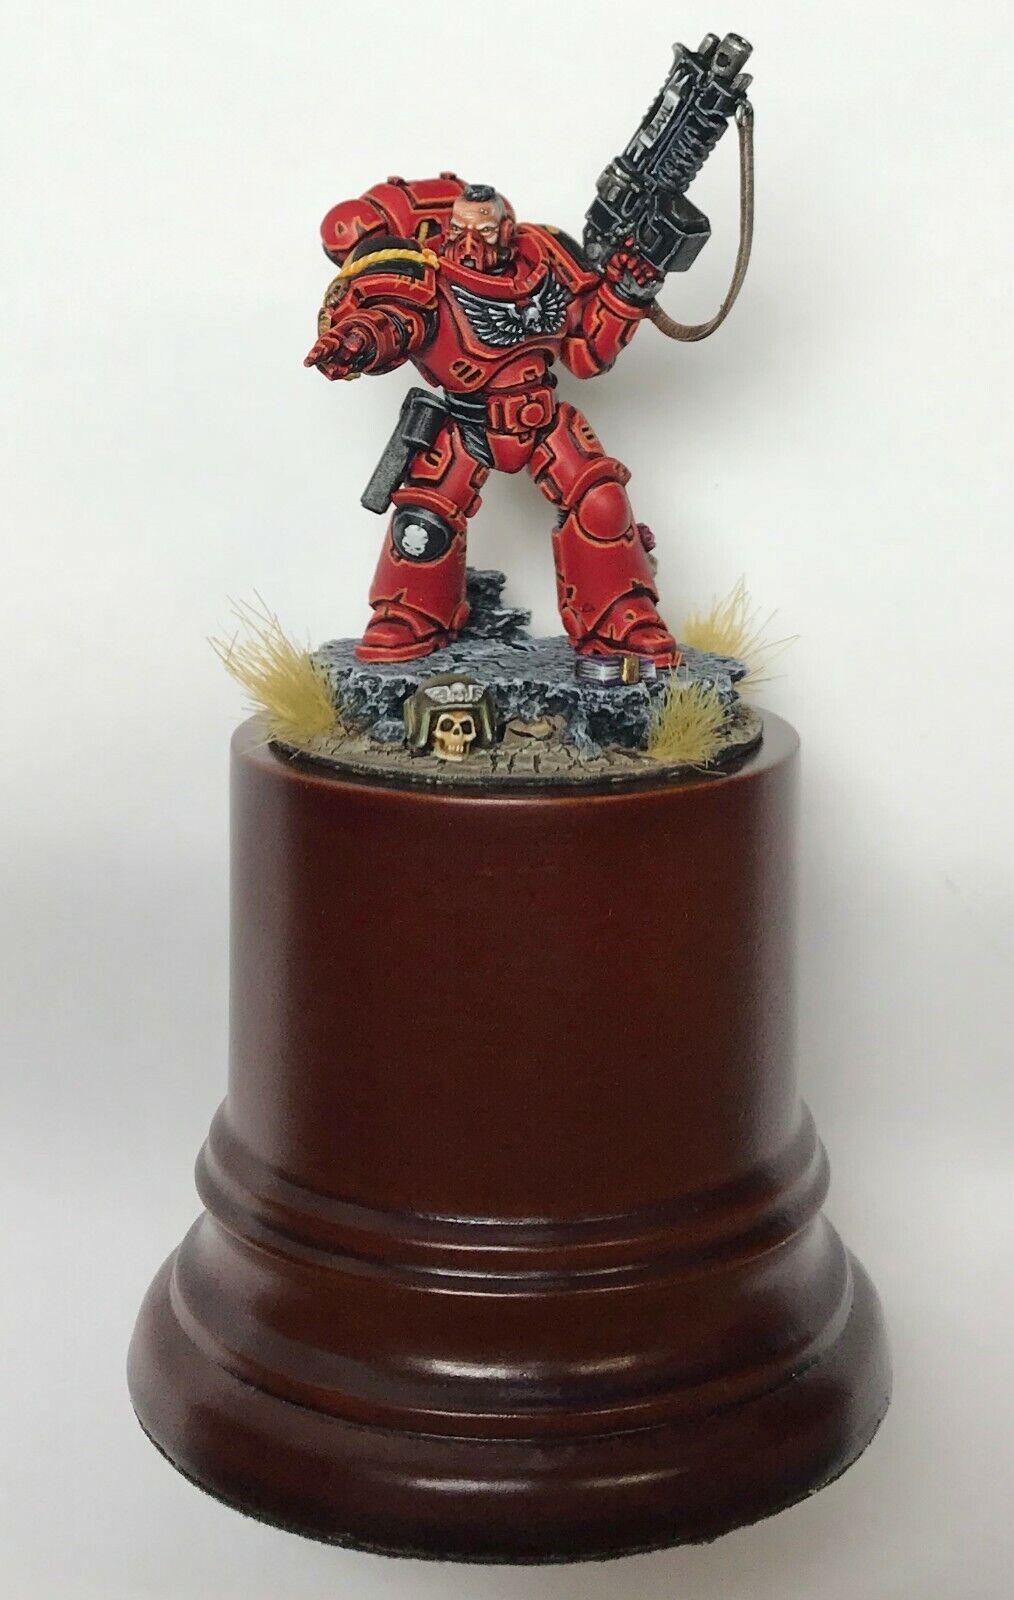 Warhammer 40k Space Marine Blood Angels Sergeant DisJugar Painted